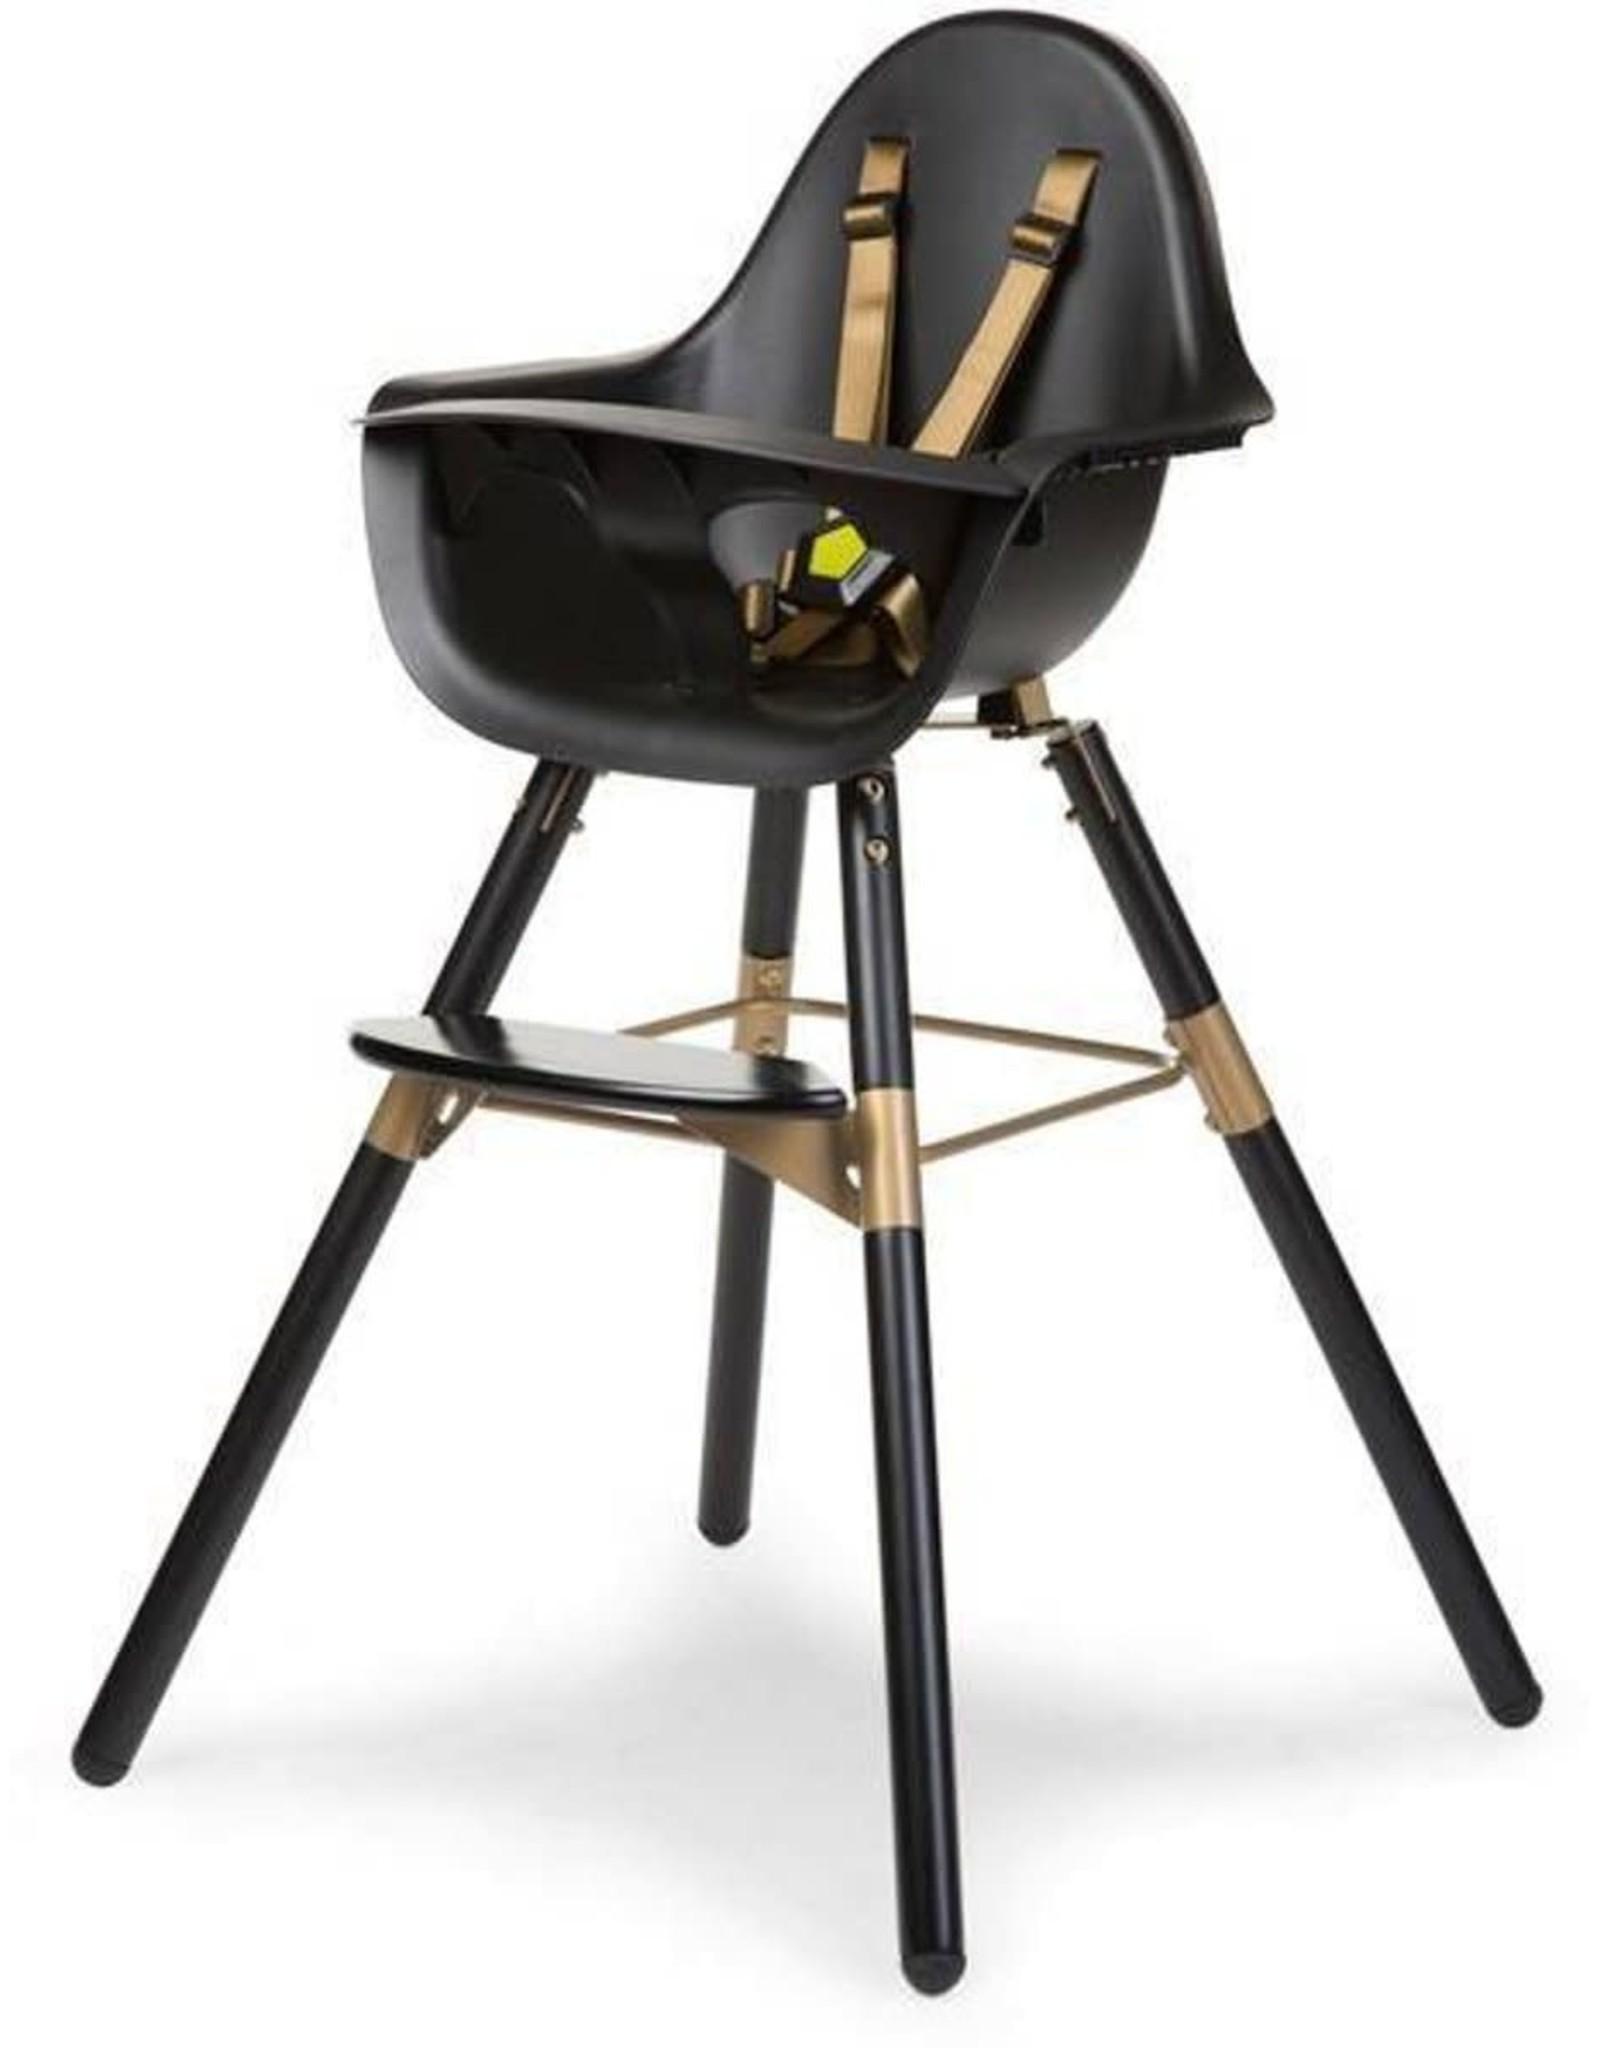 Childhome Childhome evolu 2 stoel zwart/ goud 2in1 + beugel